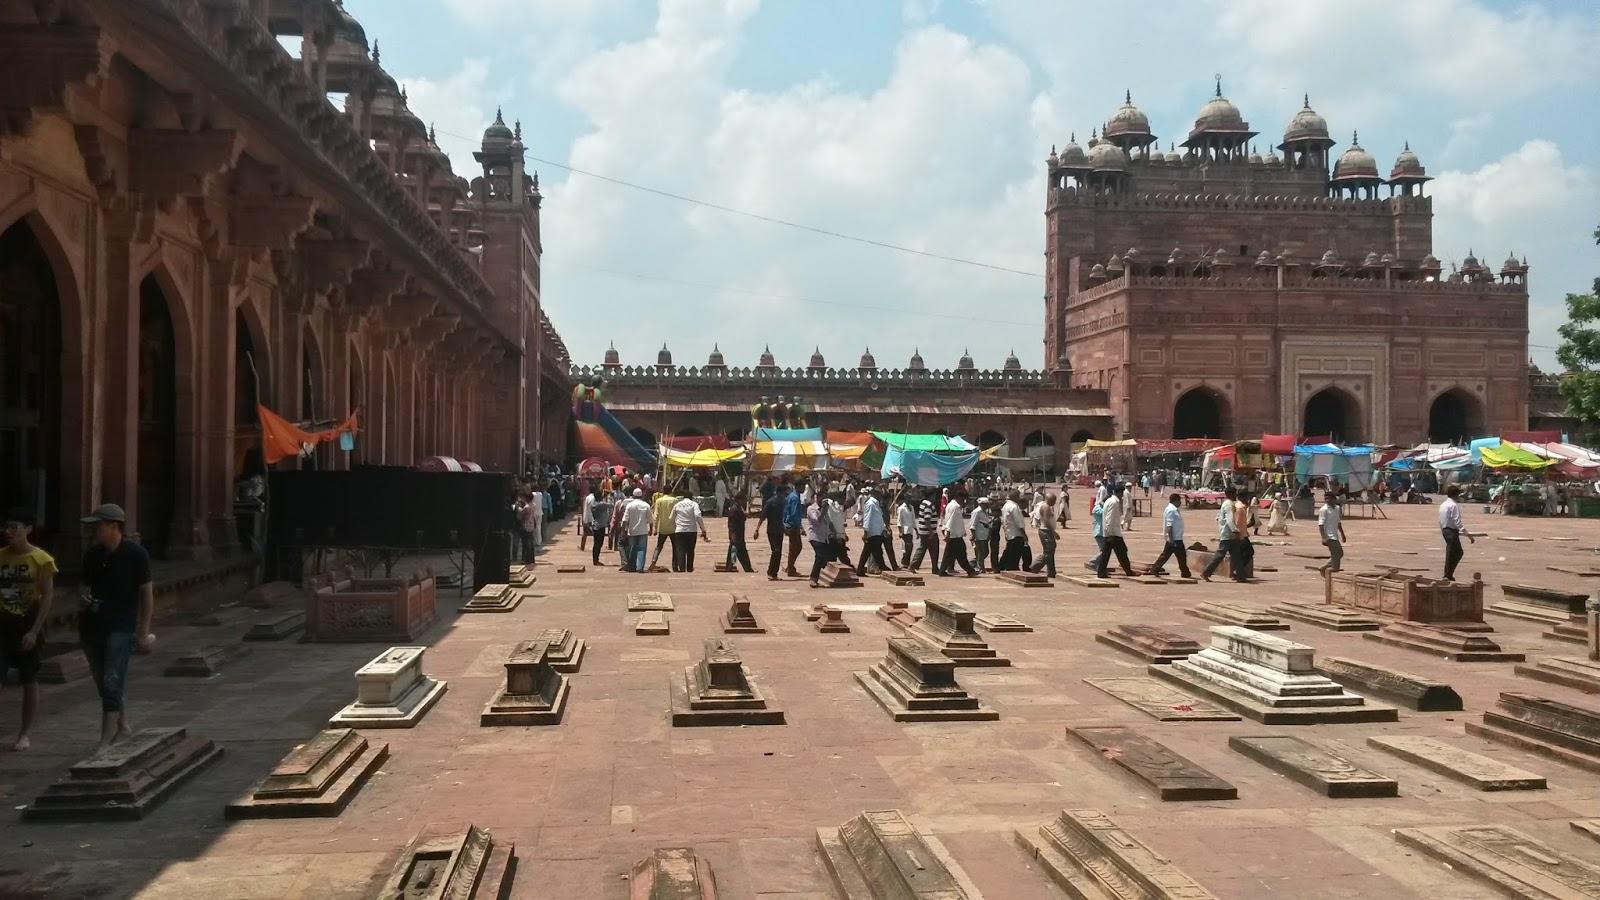 fatehpur sikri agra hindistan india